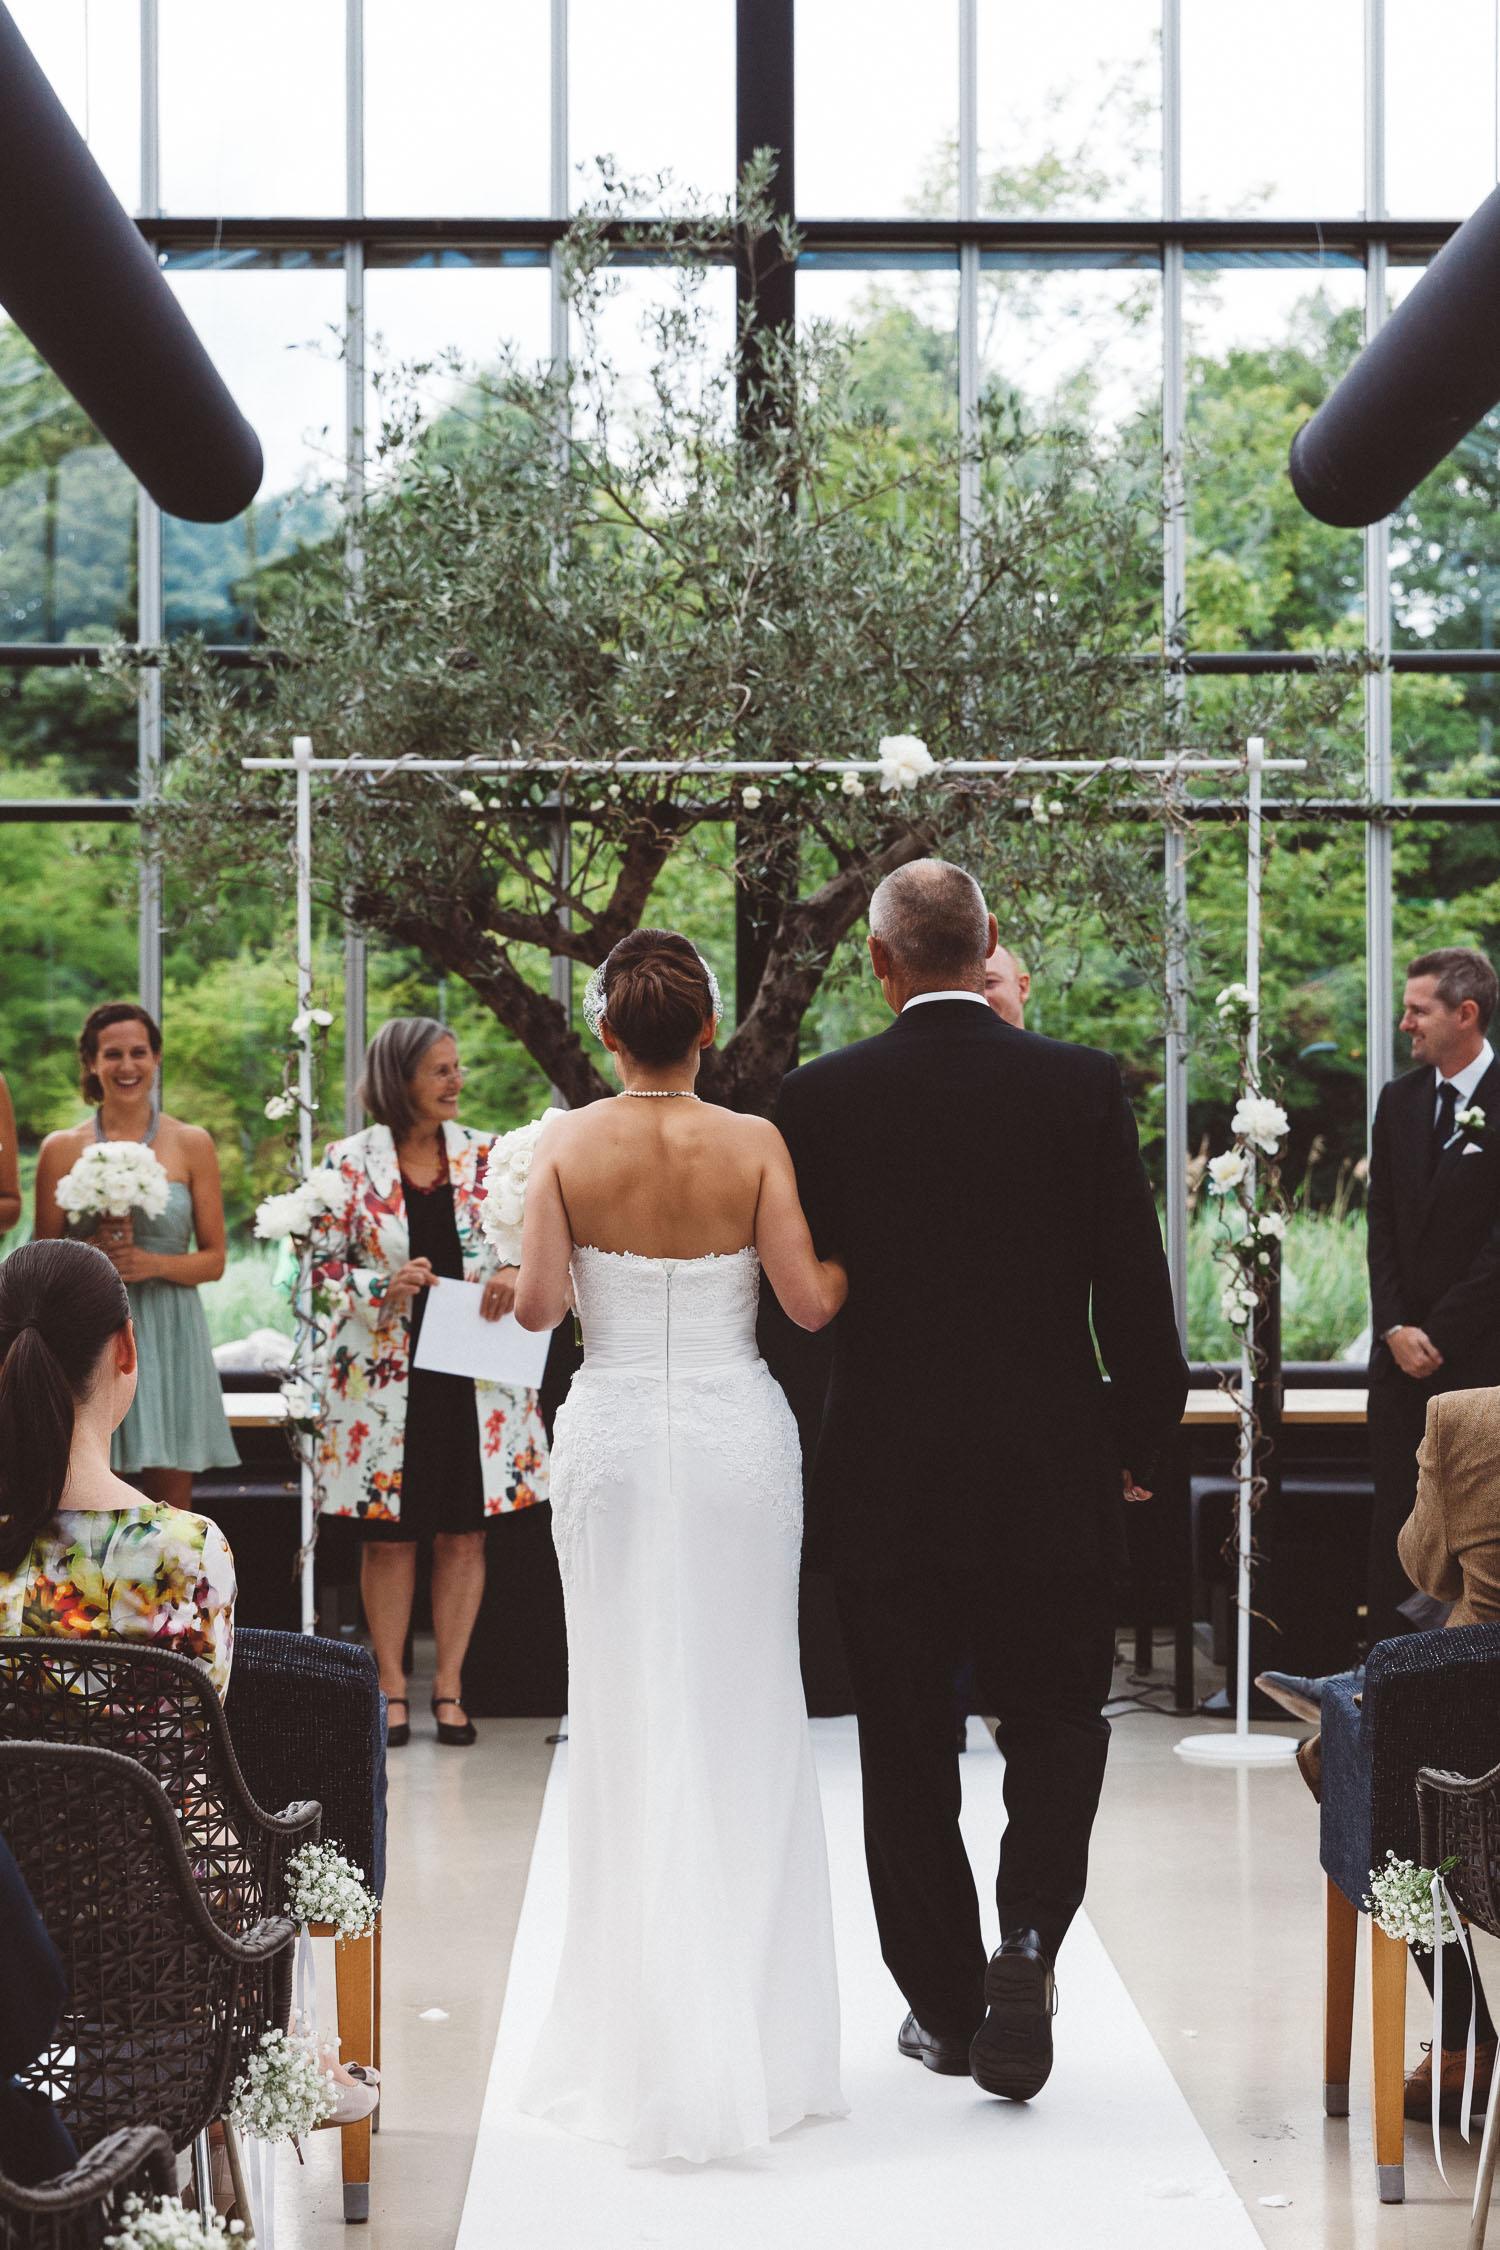 Wedding-huwelijk-trouwen-bruiloft-photography-fotografie-fotograaf-photographer-restaurant-de-Kas-On-a-hazy-morning-Amsterdam-The-Netherlands-7.jpg